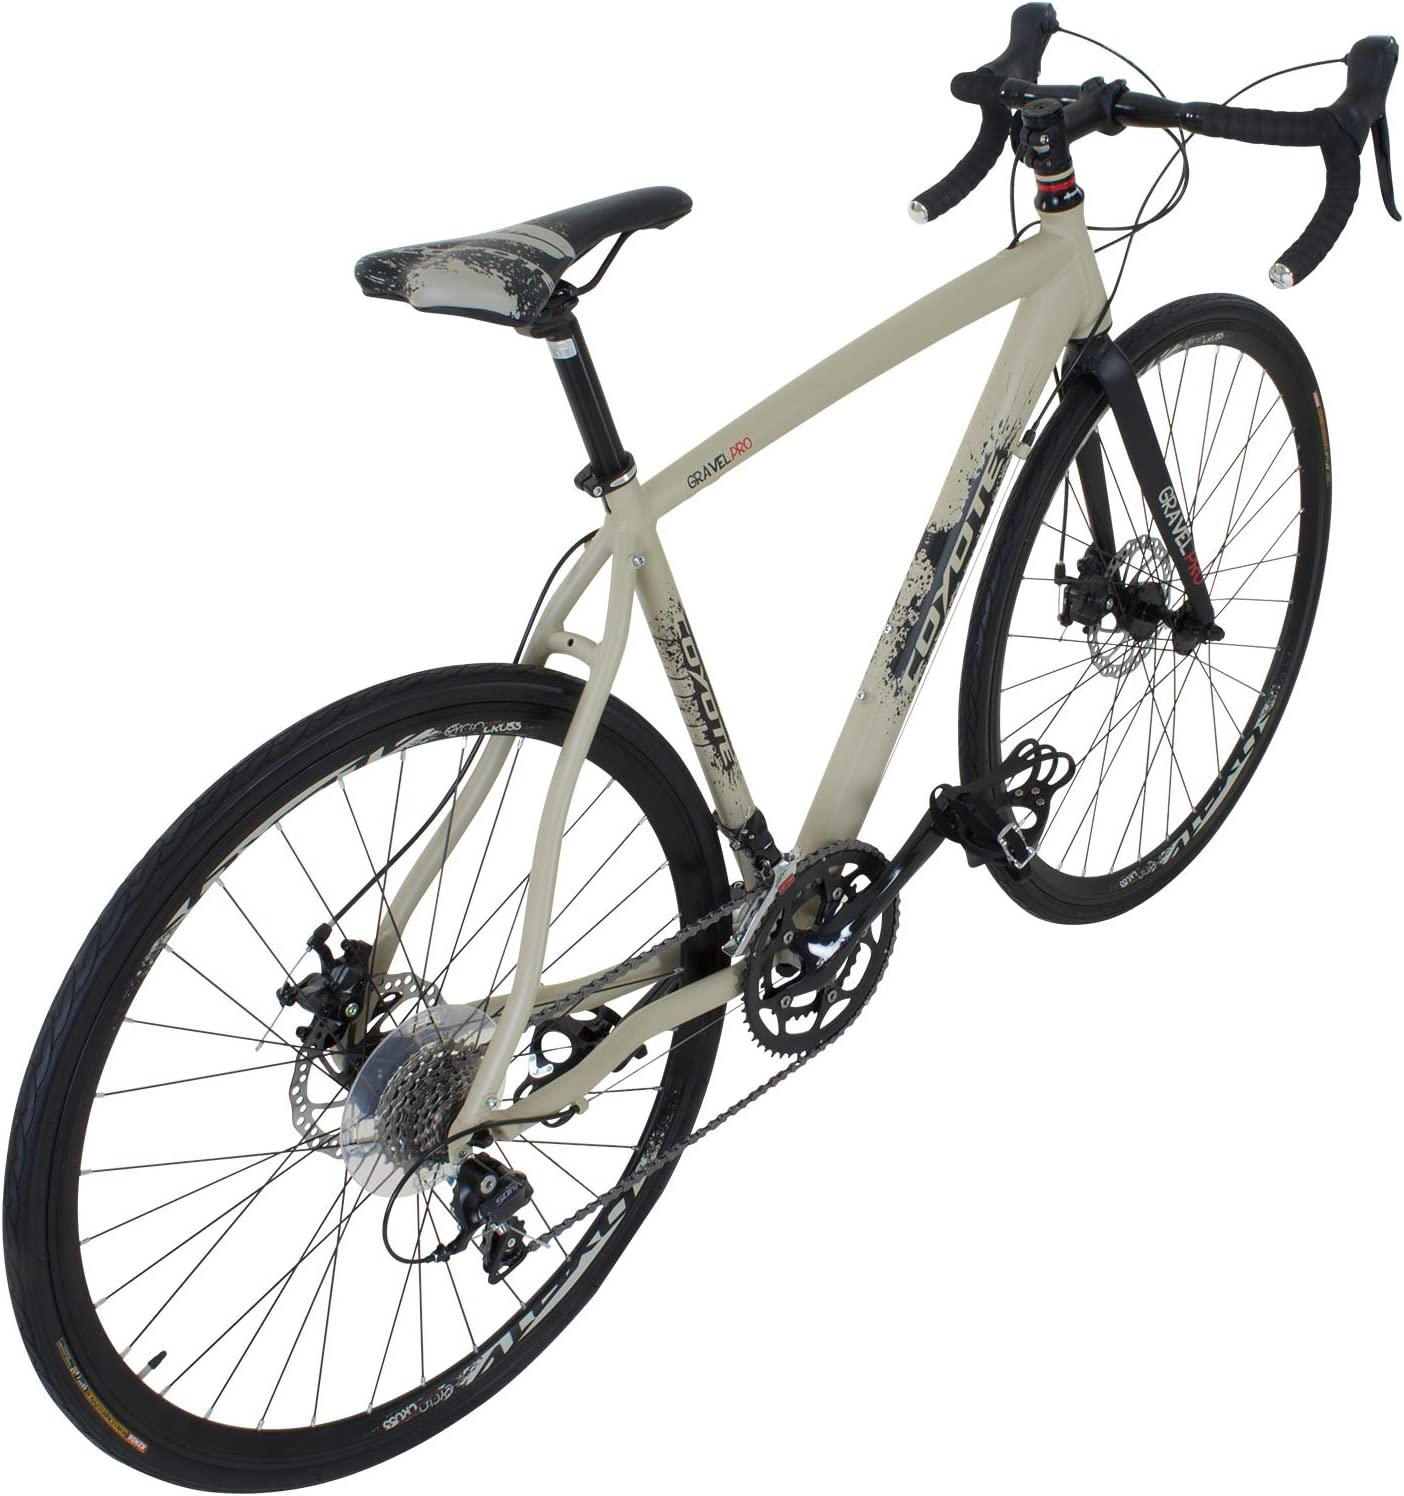 Bicicleta 700 C de Coyote Gravel Pro Cyclocross, bicicleta de ...